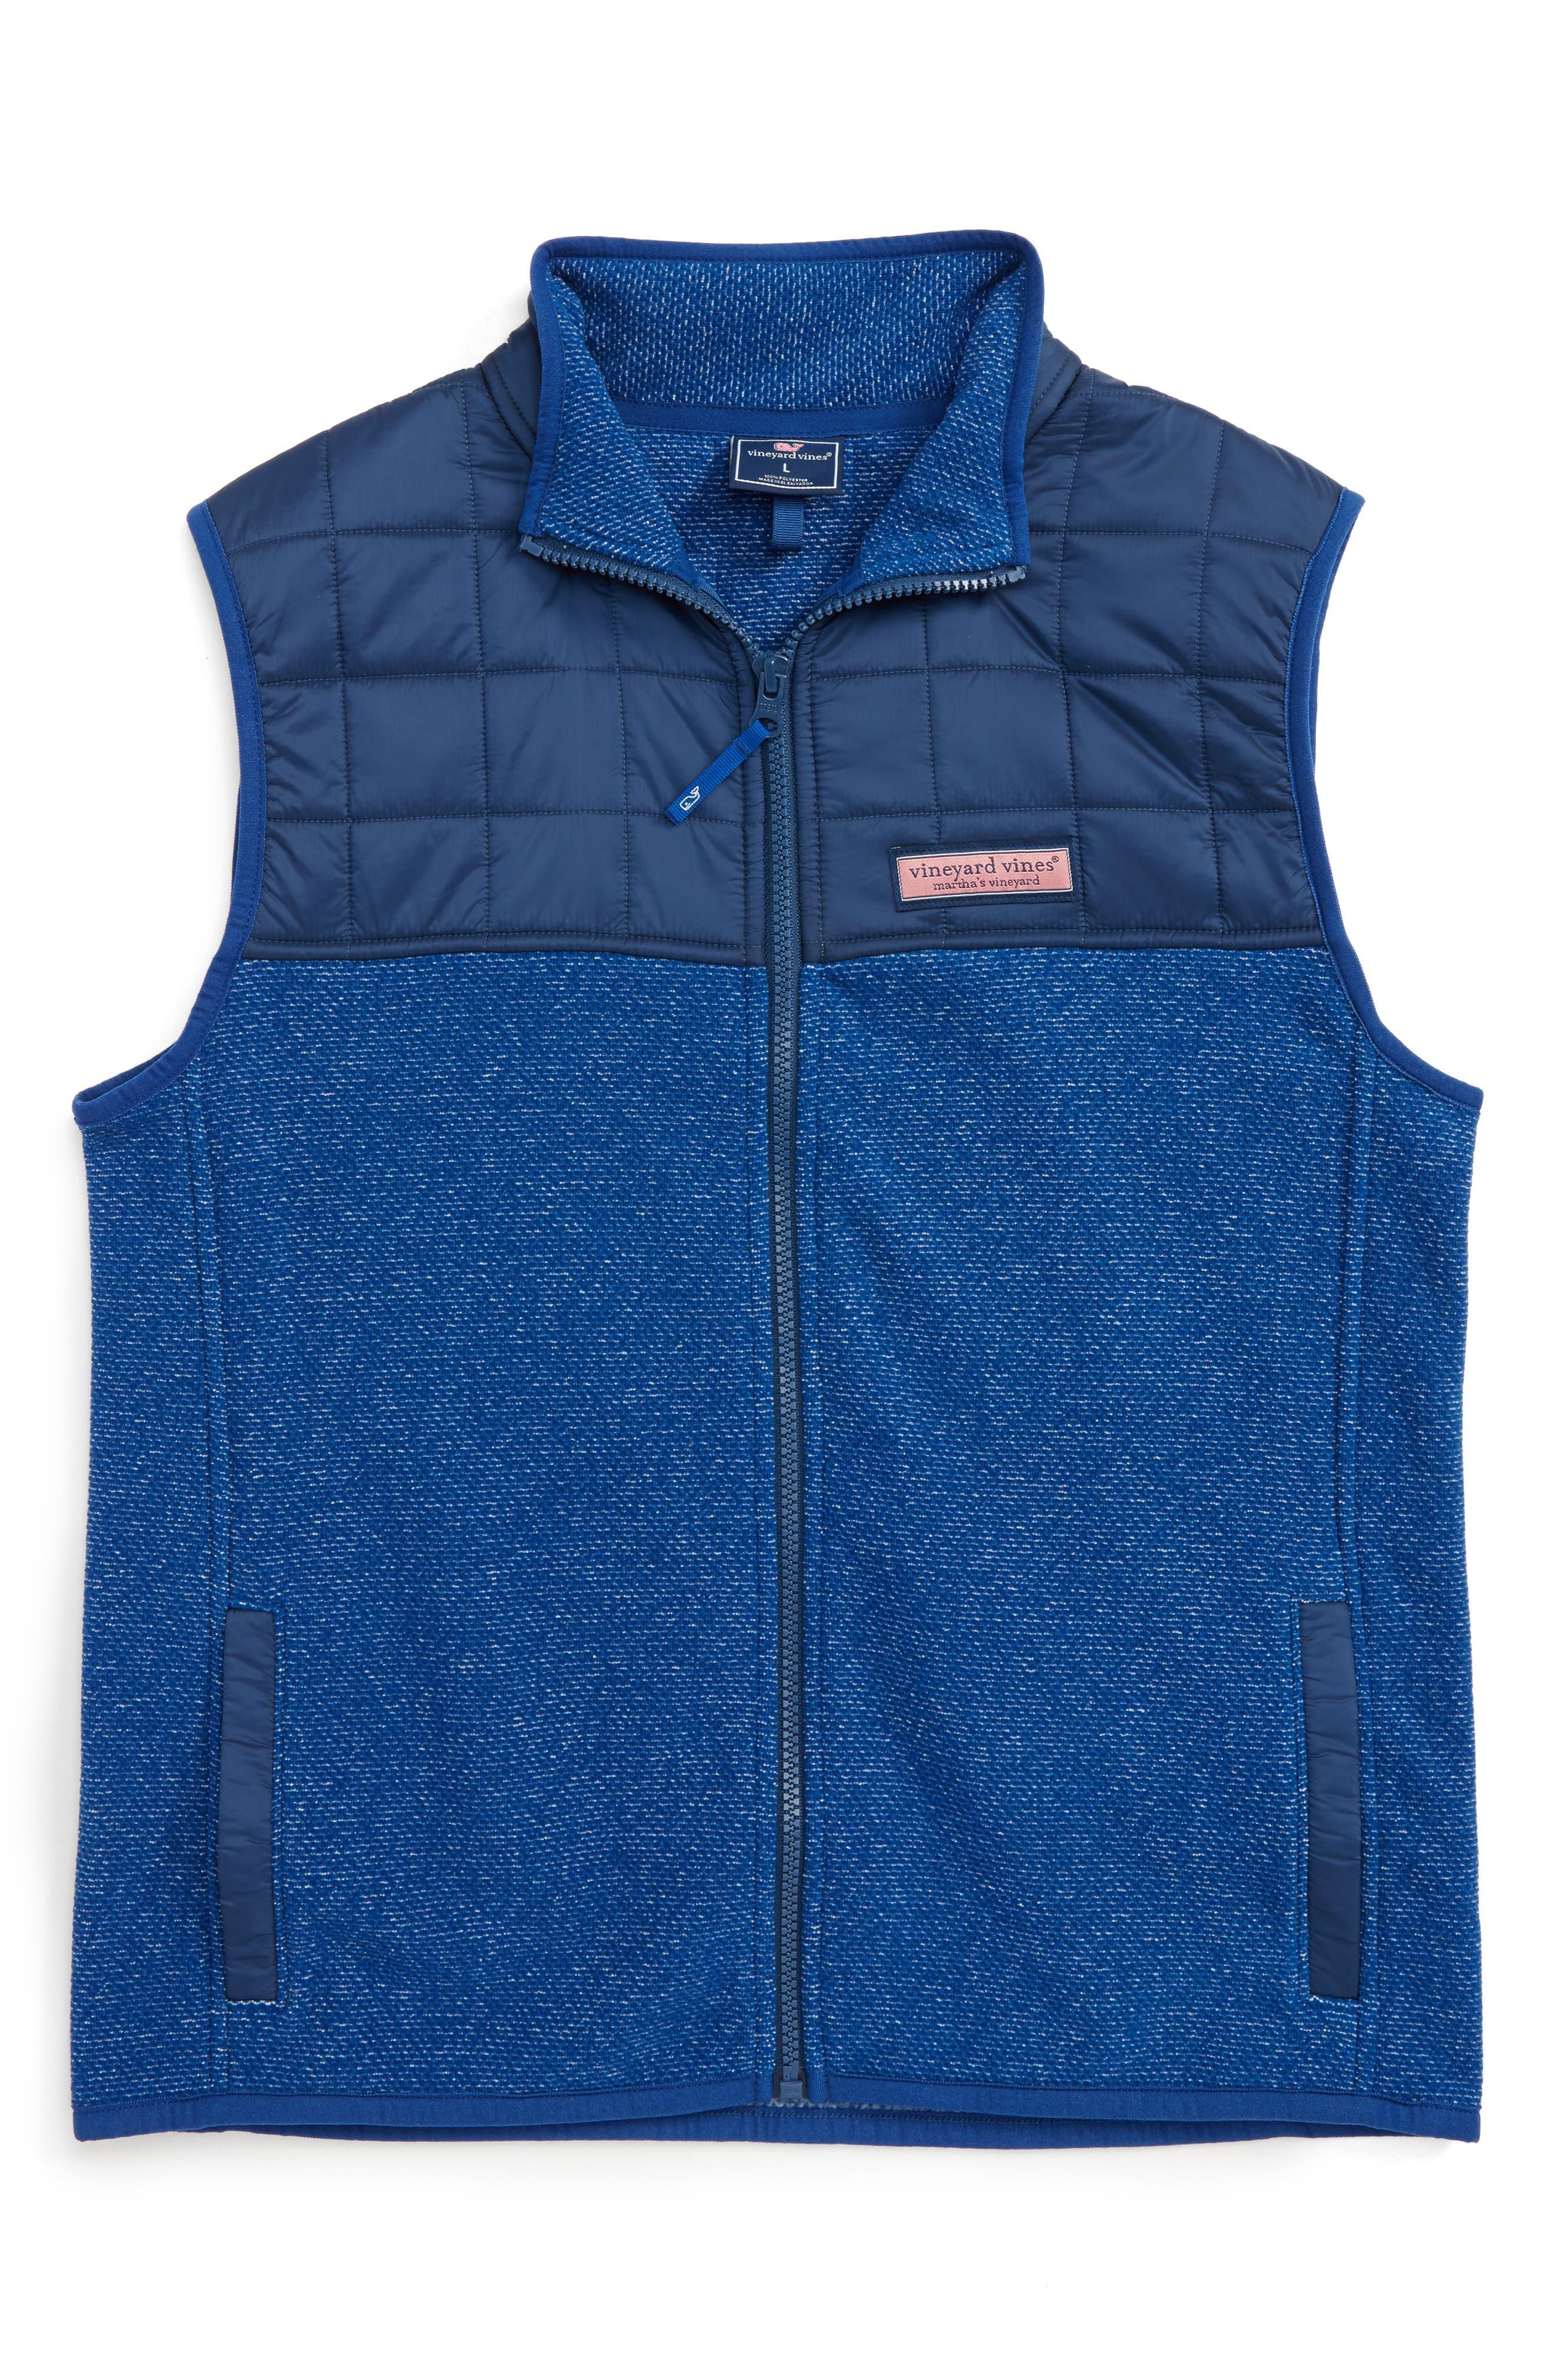 Main Image - vineyard vines Jacquard Fleece Vest (Big Boys)